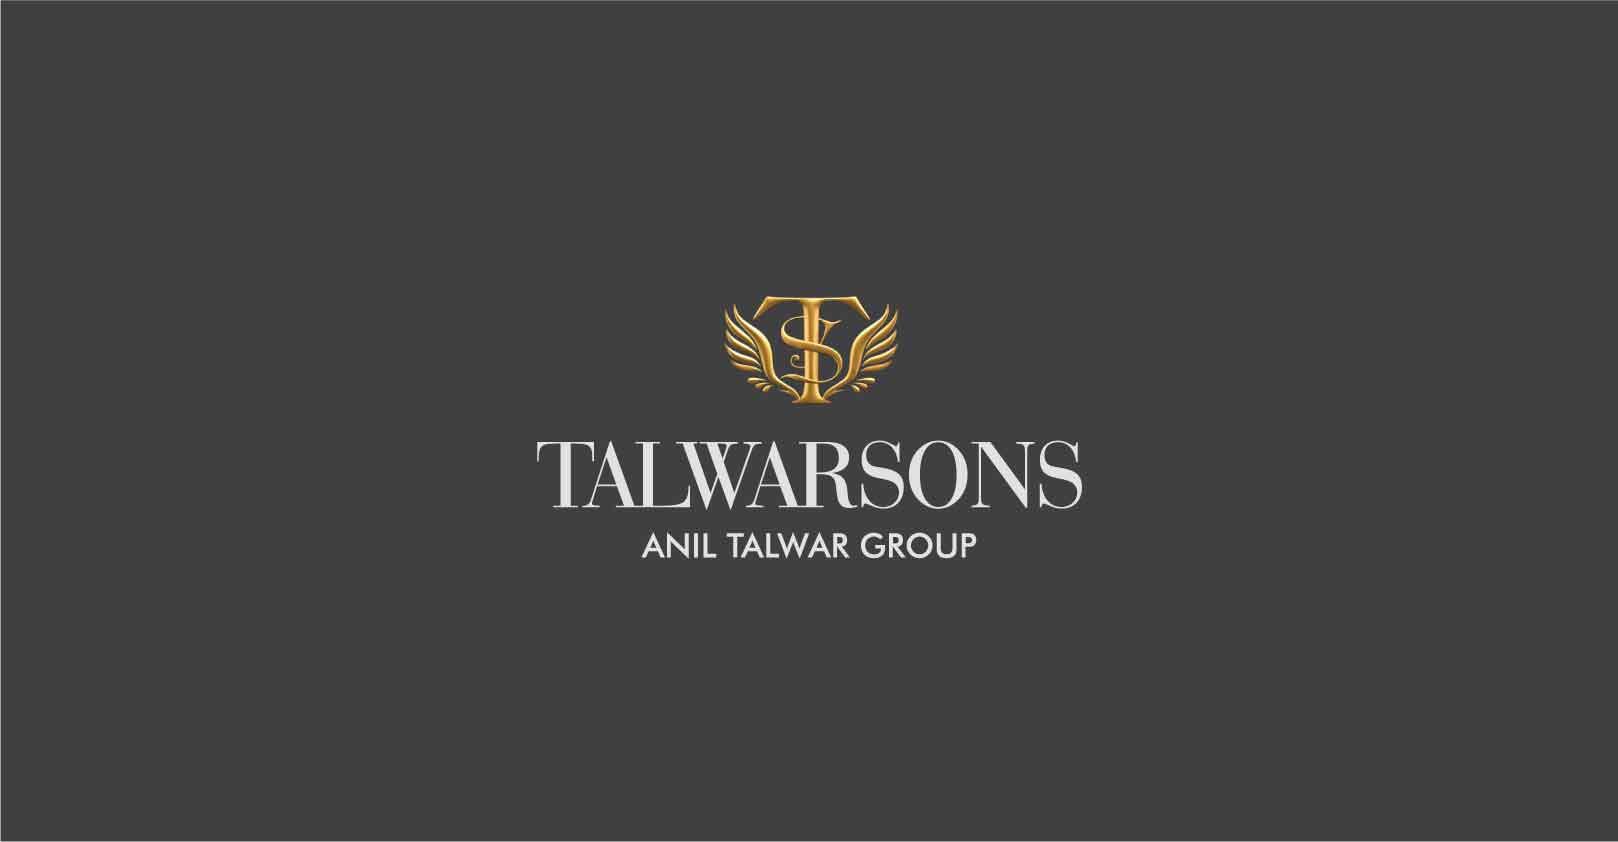 Talwarsons